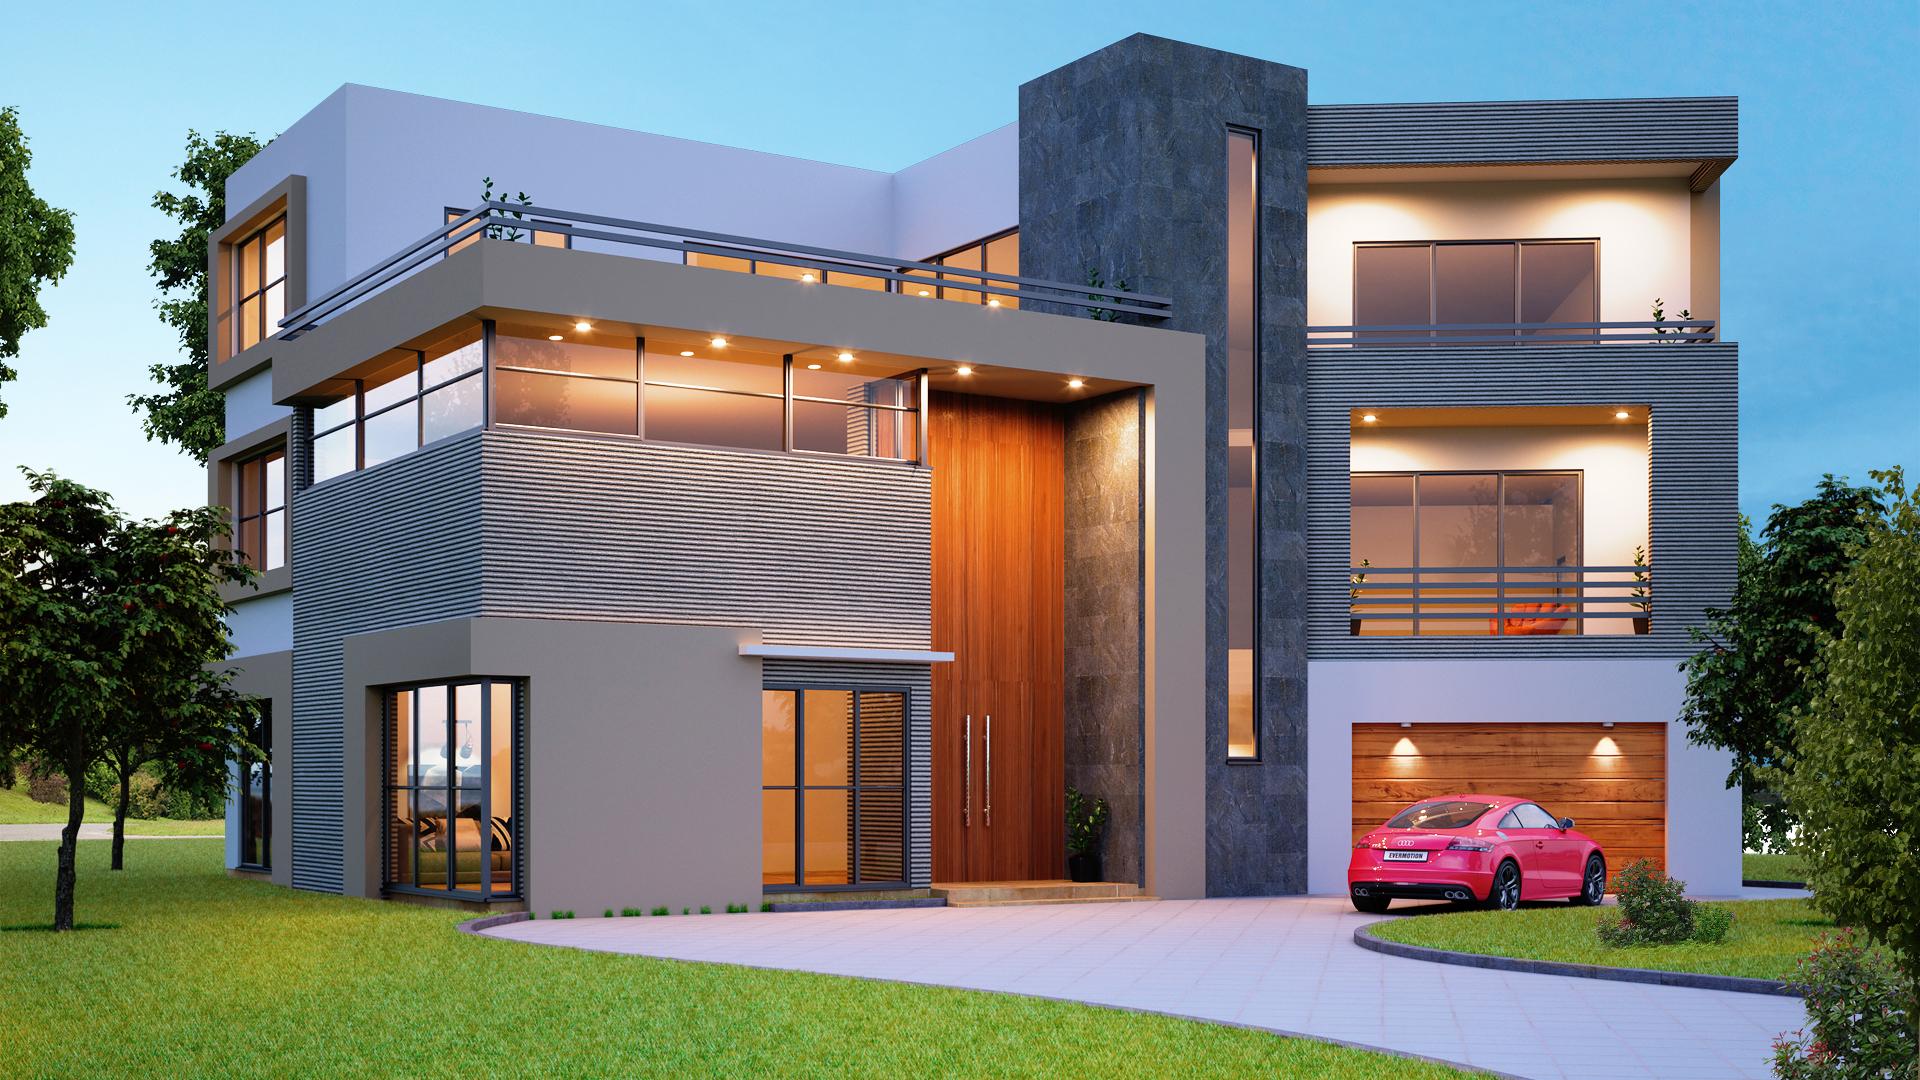 TYPE b1 - Fre Tsega Real Estate